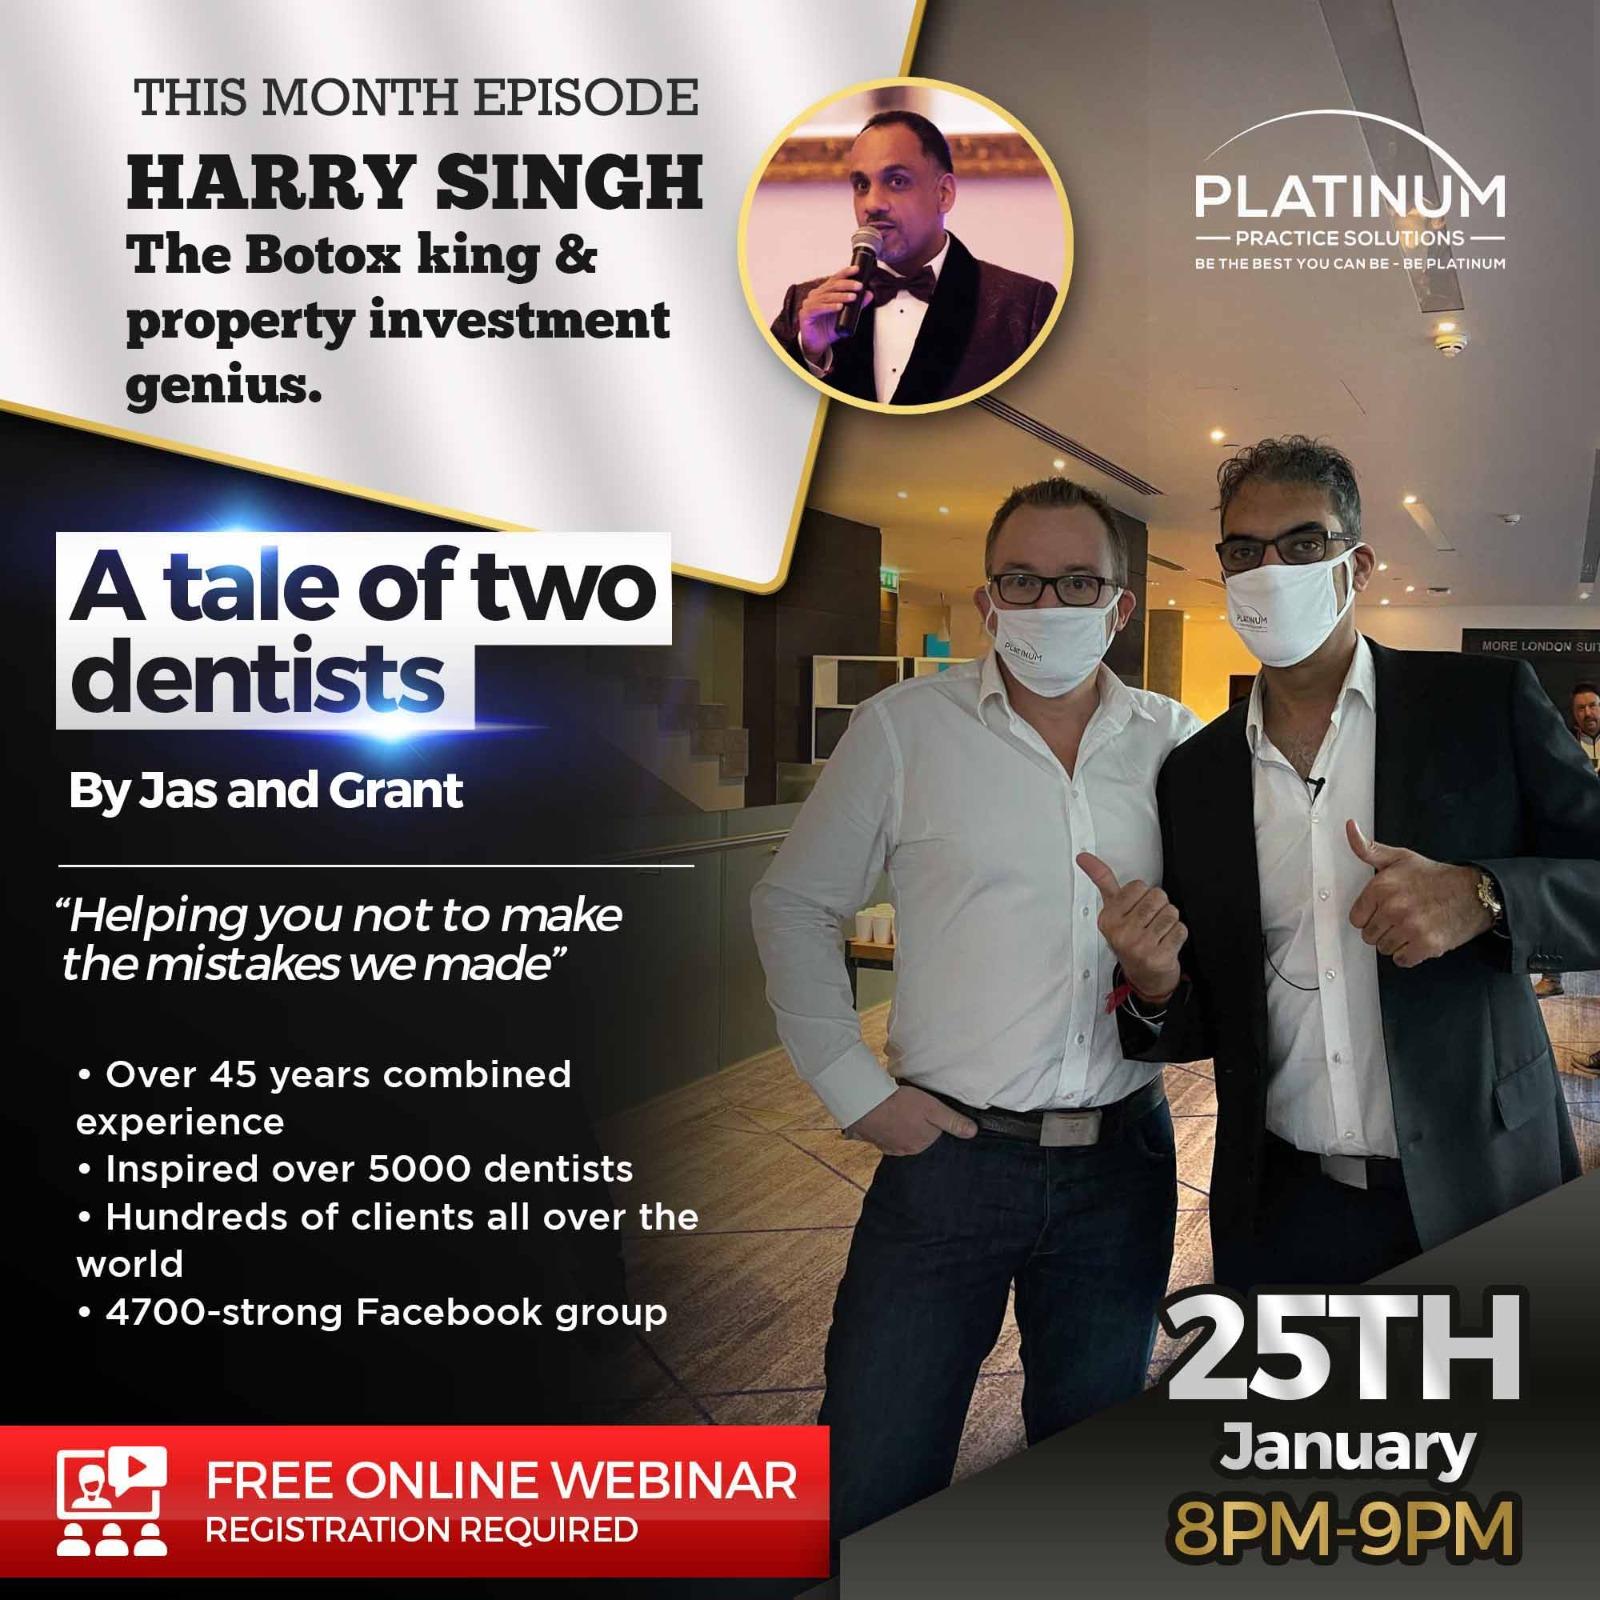 Platinum Practice Solutions Webinar with Harry Singh